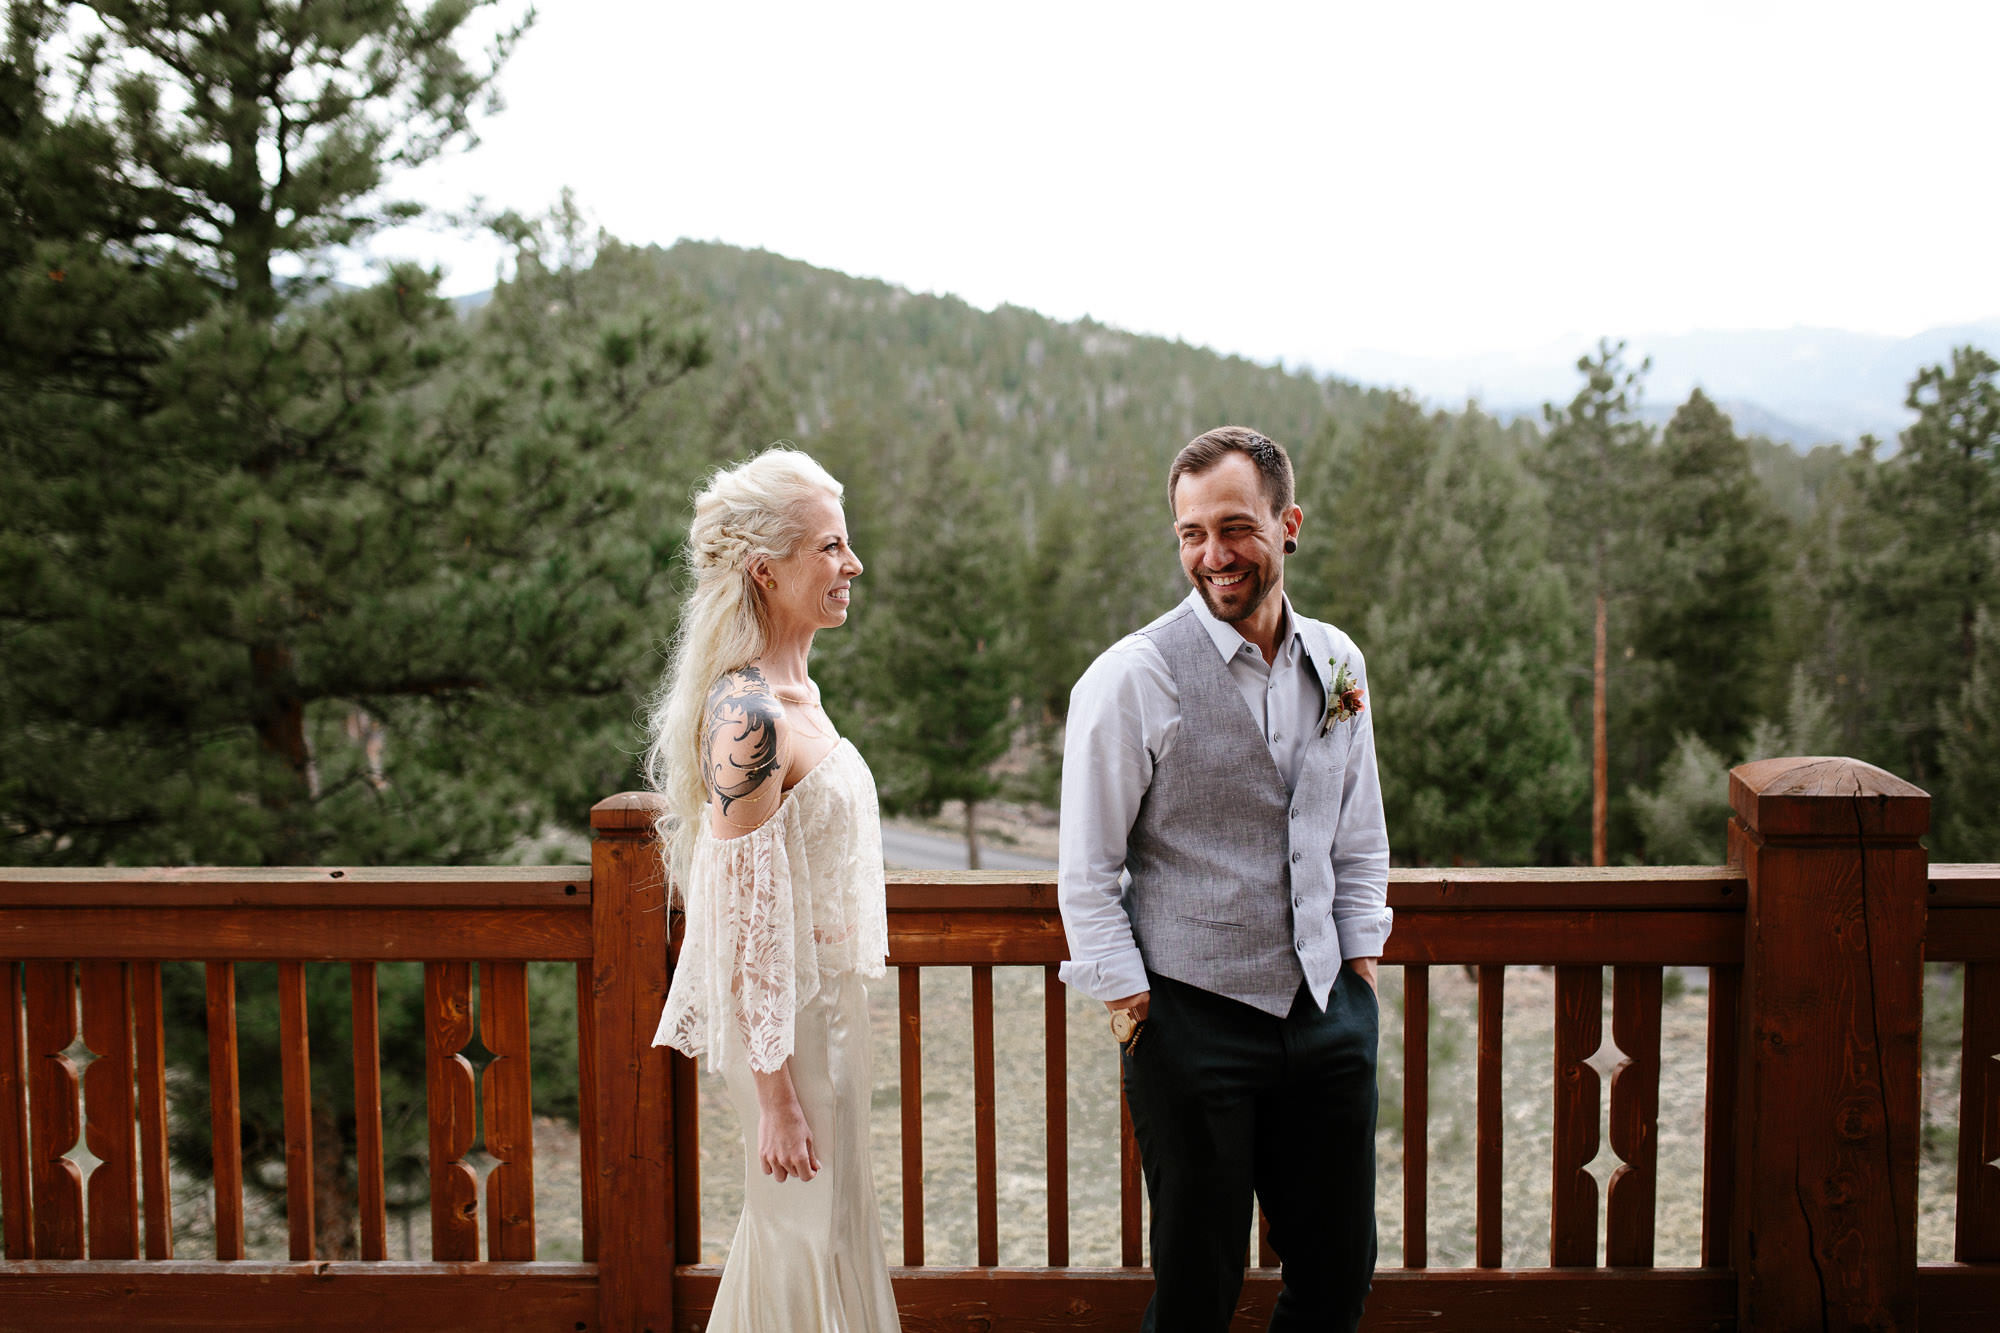 bucci-barn-wedding-elopement-evergreen-boulder-denver-colorado-adventerous-romantic-timeless-033.jpg